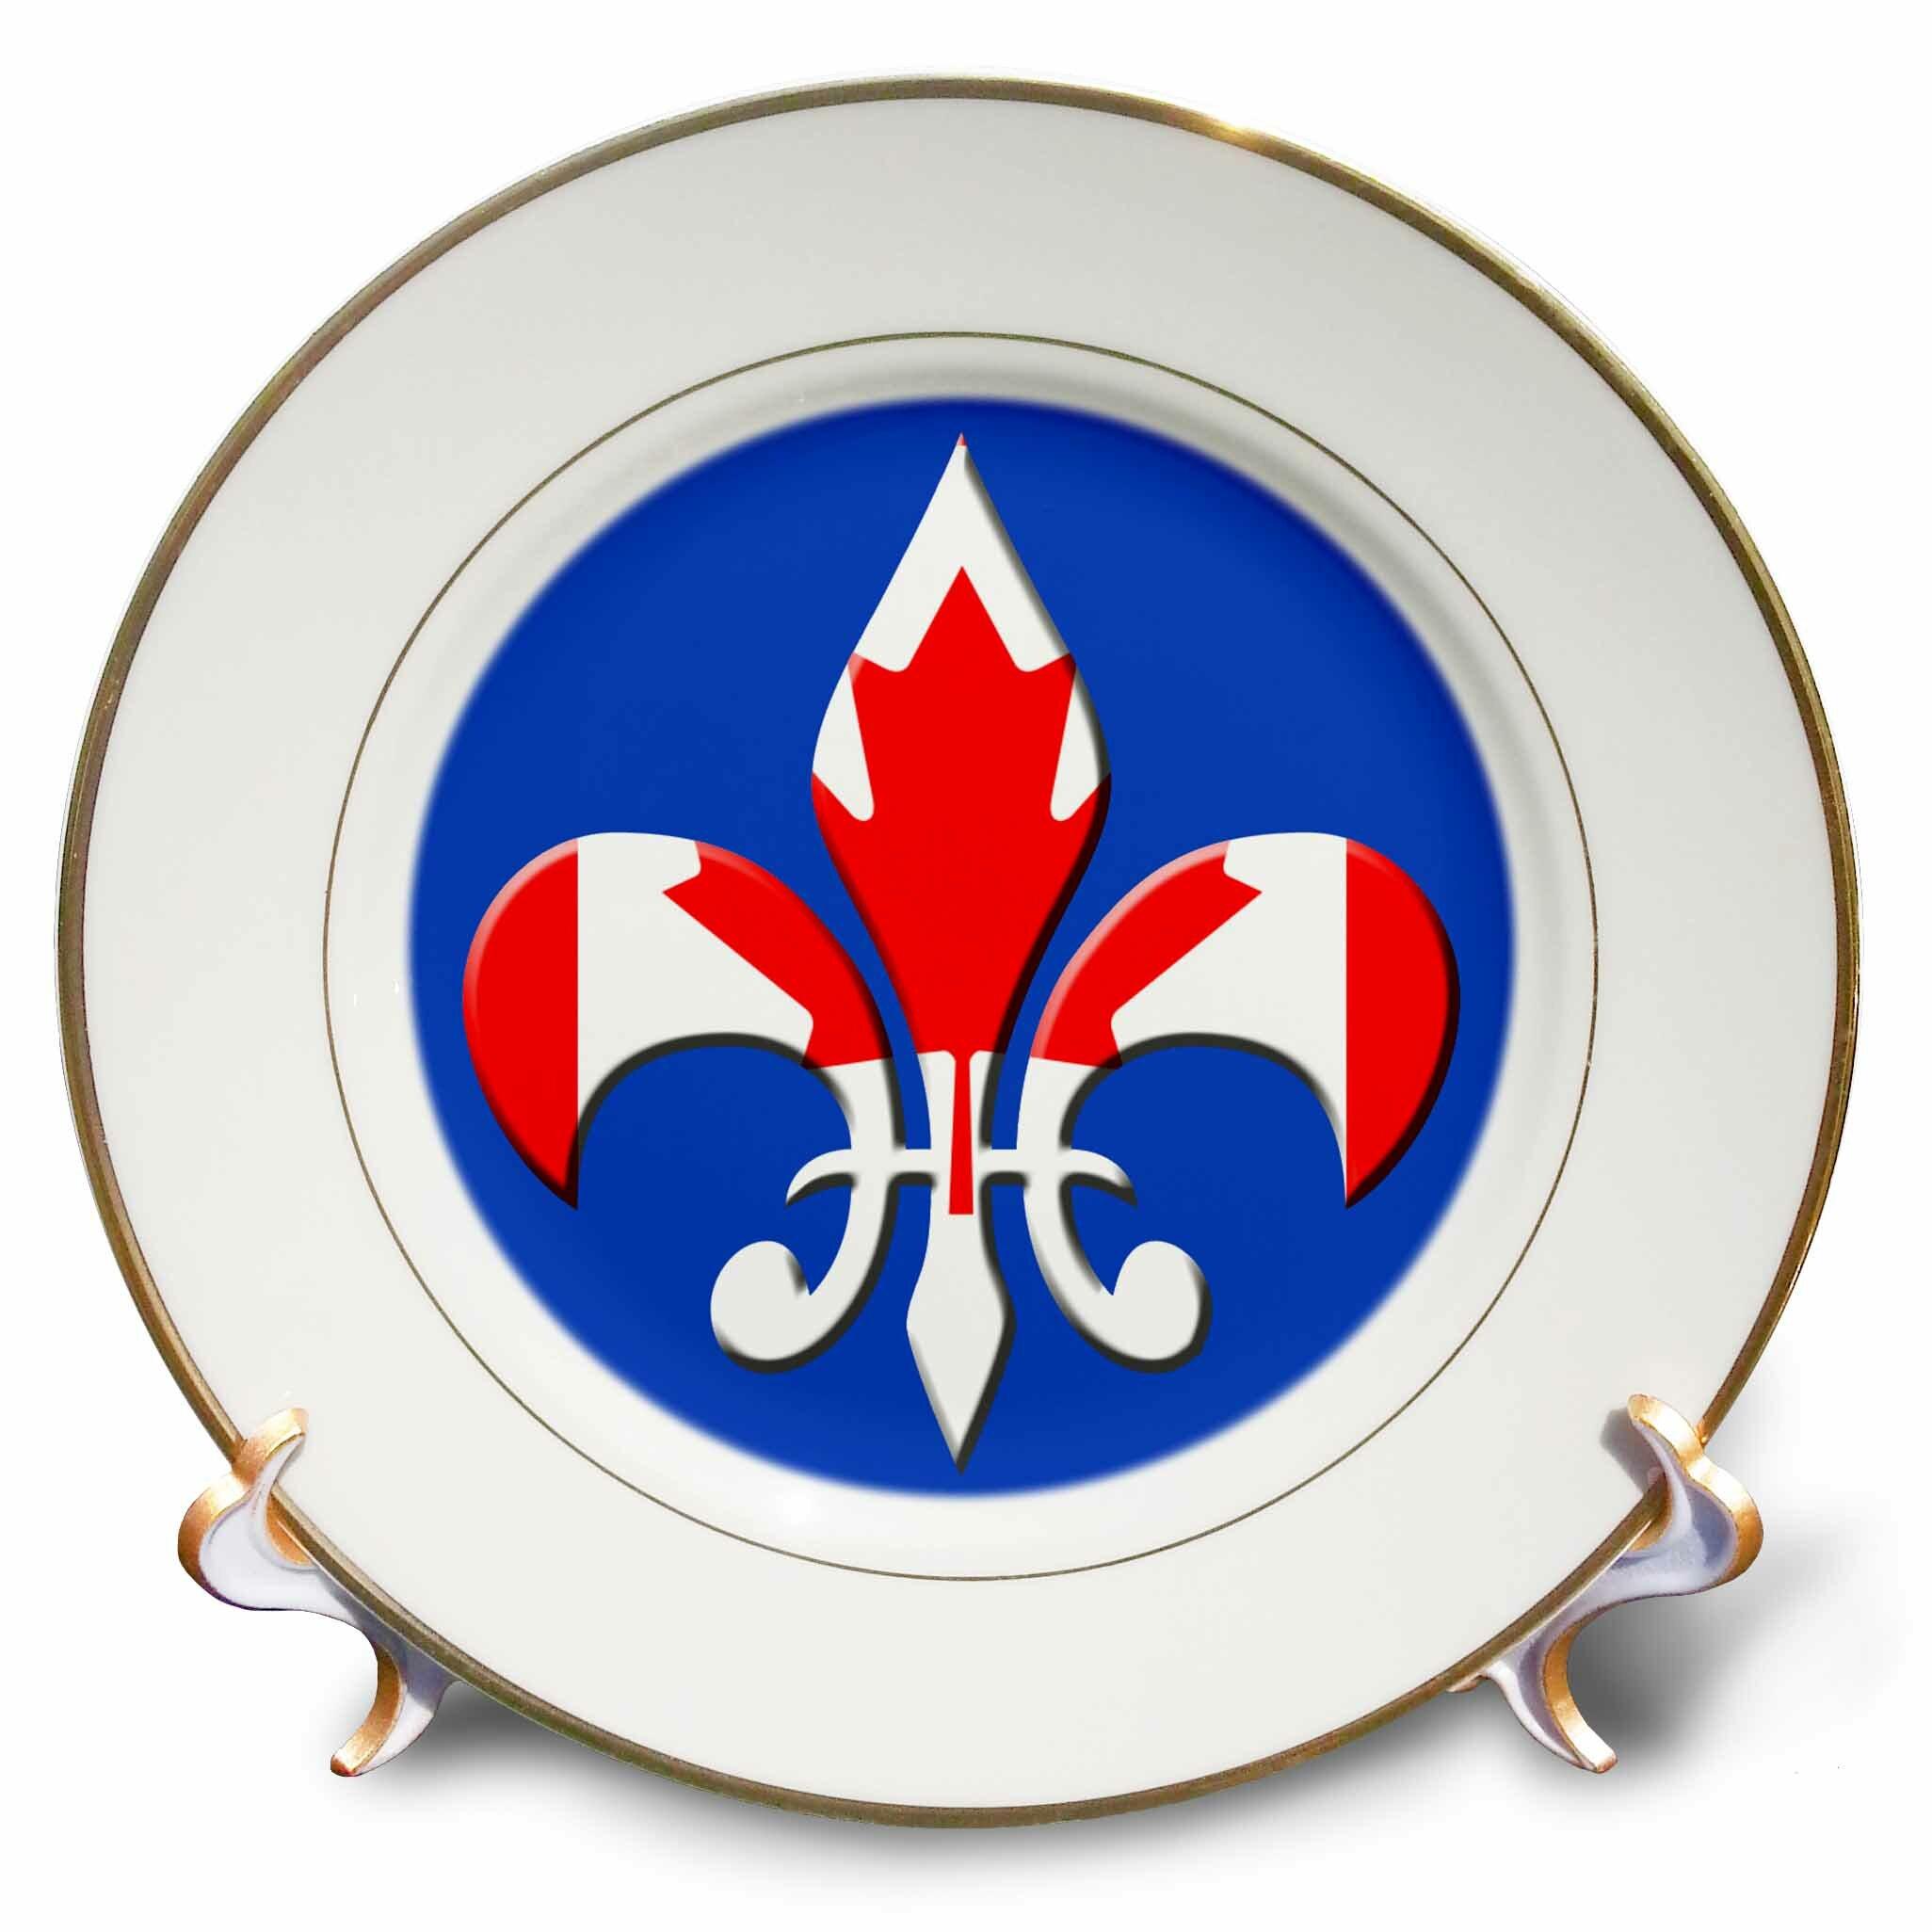 Large Fleur De Lis With Canadian Flag Overlay Porcelain Decorative Plate